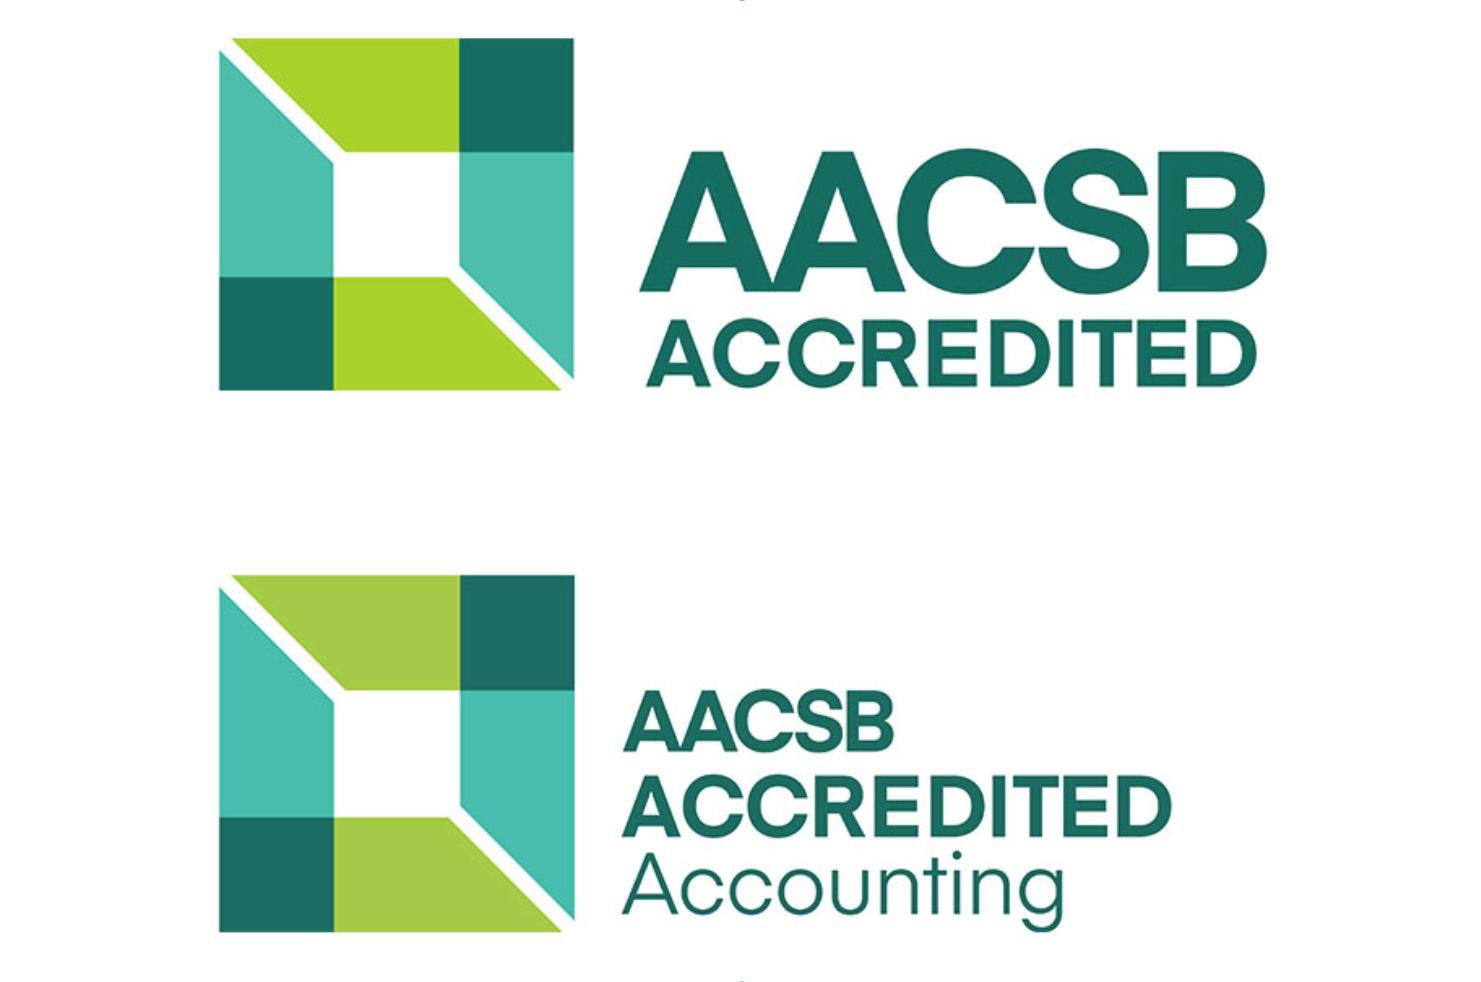 AACSB Both